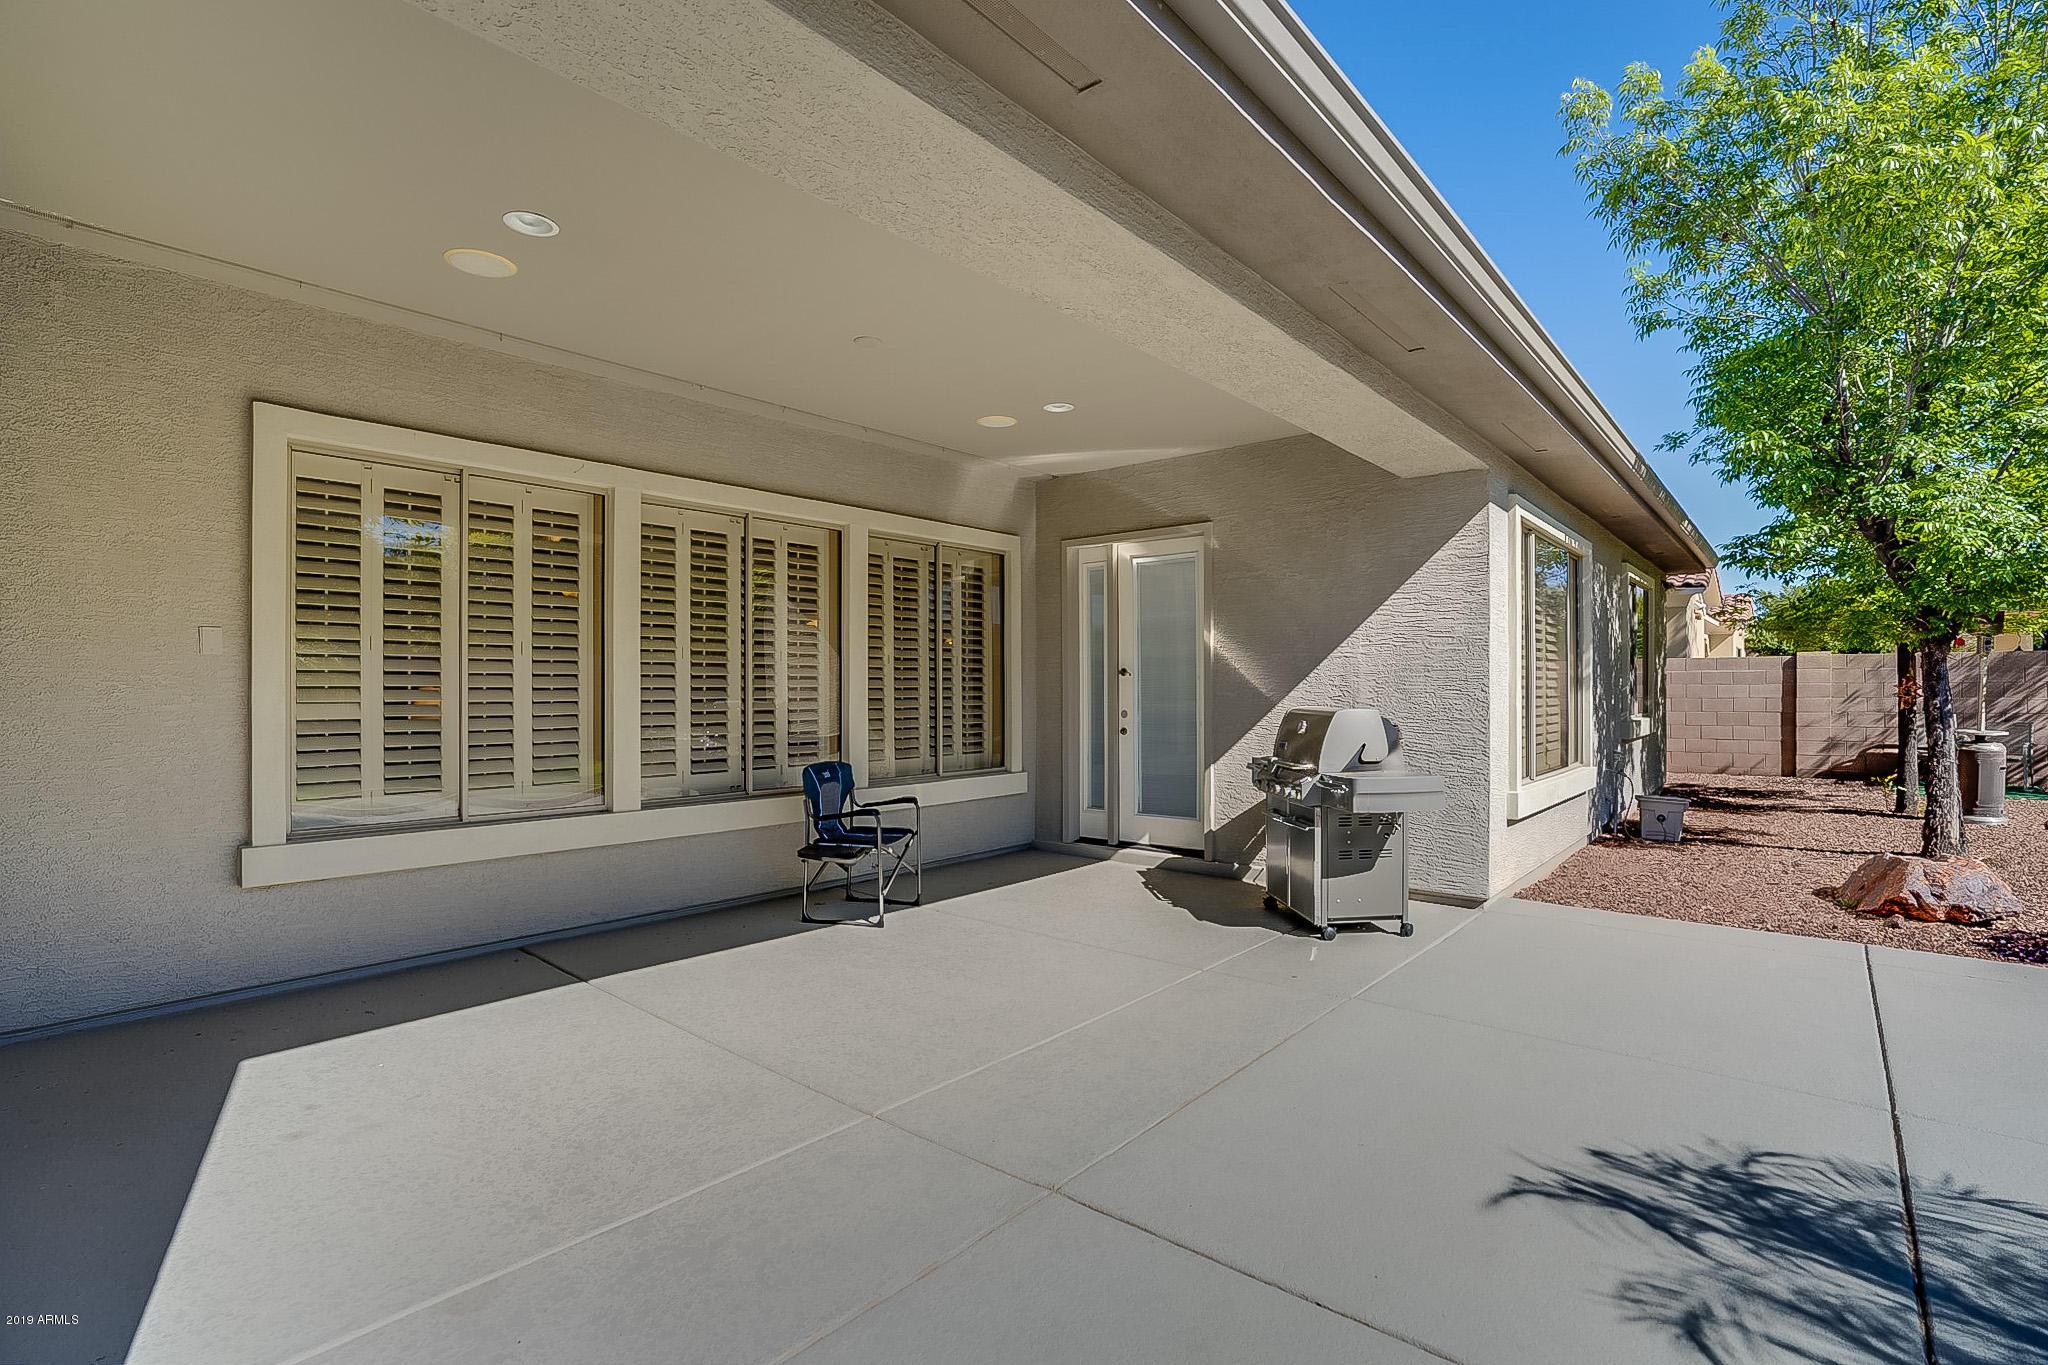 MLS 5856327 881 W MACAW Drive, Chandler, AZ 85286 Arden Park